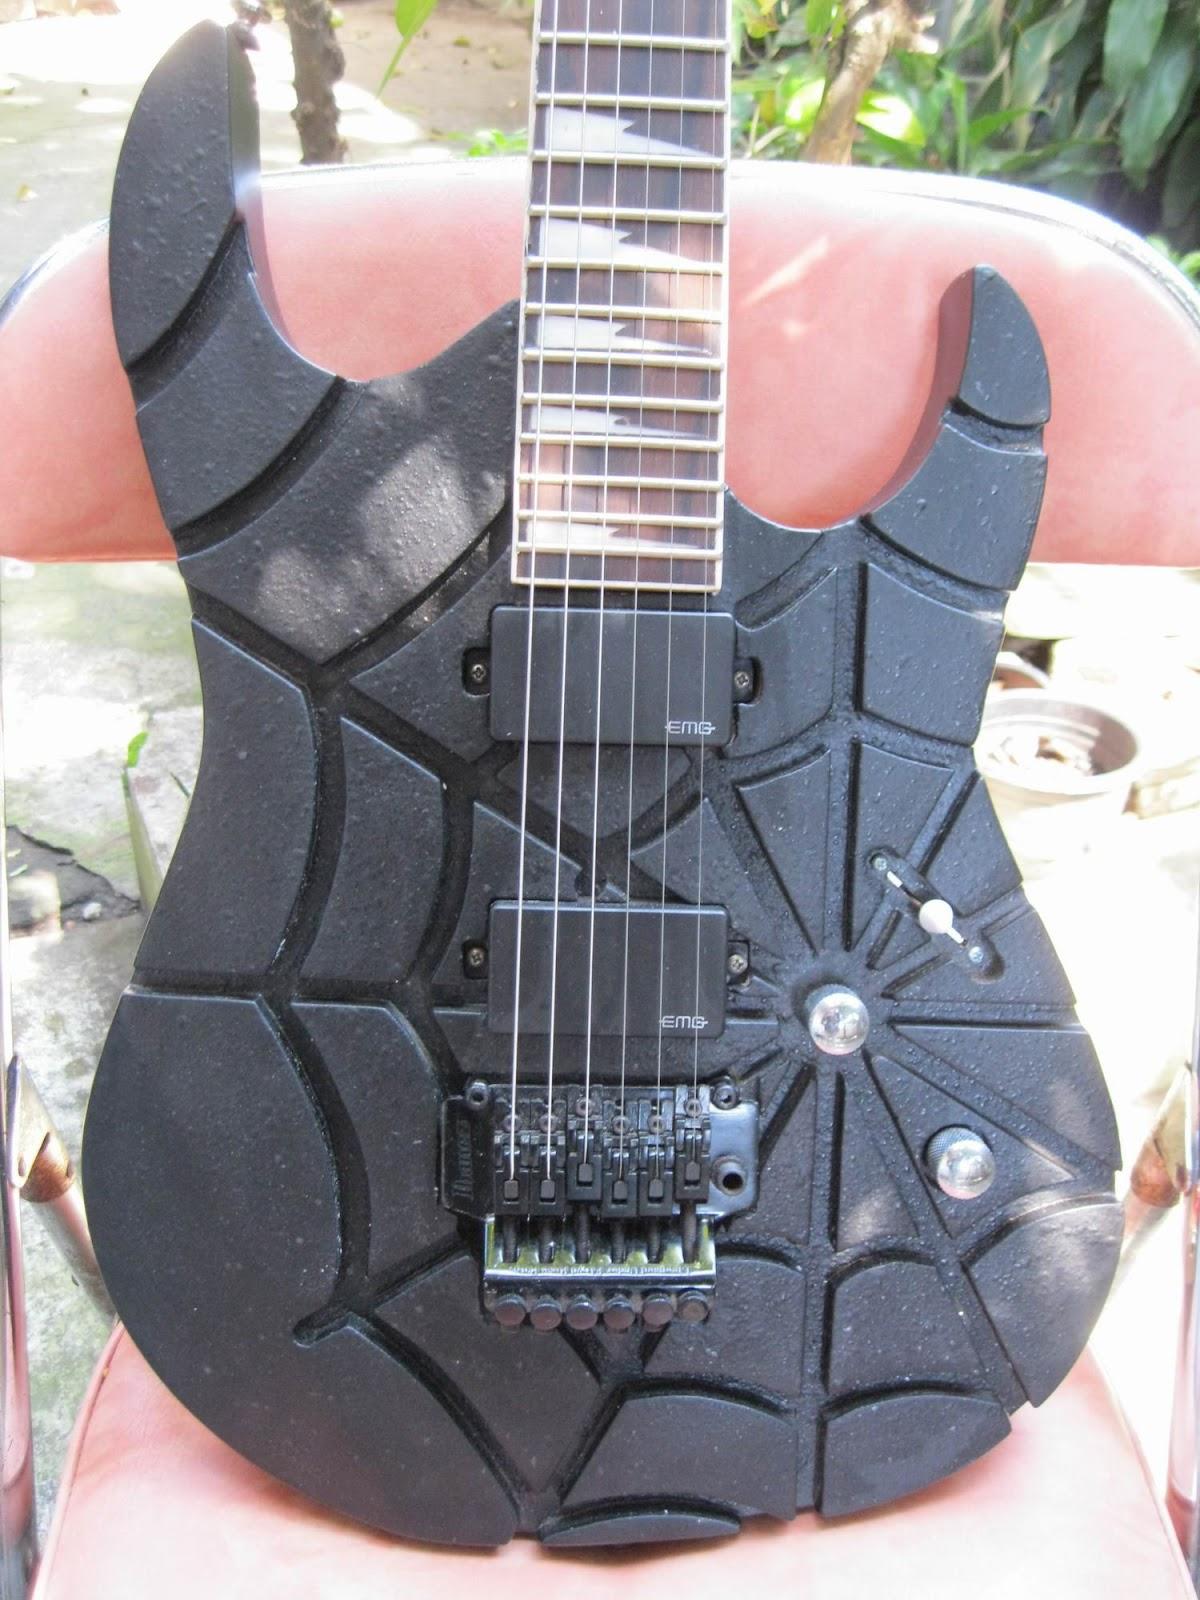 custom electric guitars shop custom electric guitars sale custom electric guitars. Black Bedroom Furniture Sets. Home Design Ideas